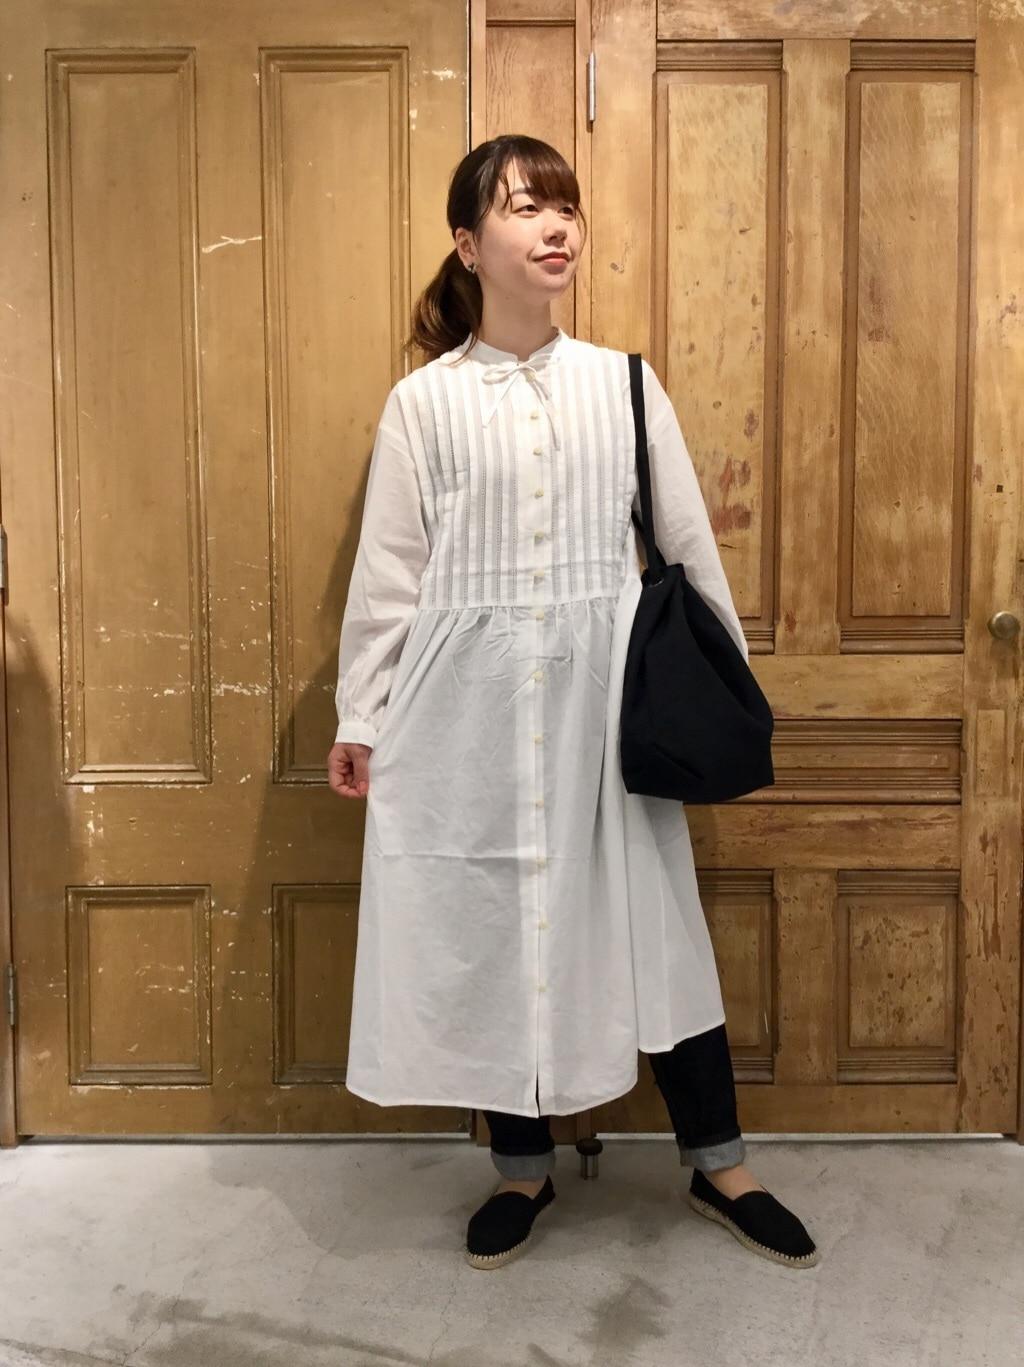 FLAT AMB 名古屋栄路面 2020.08.17